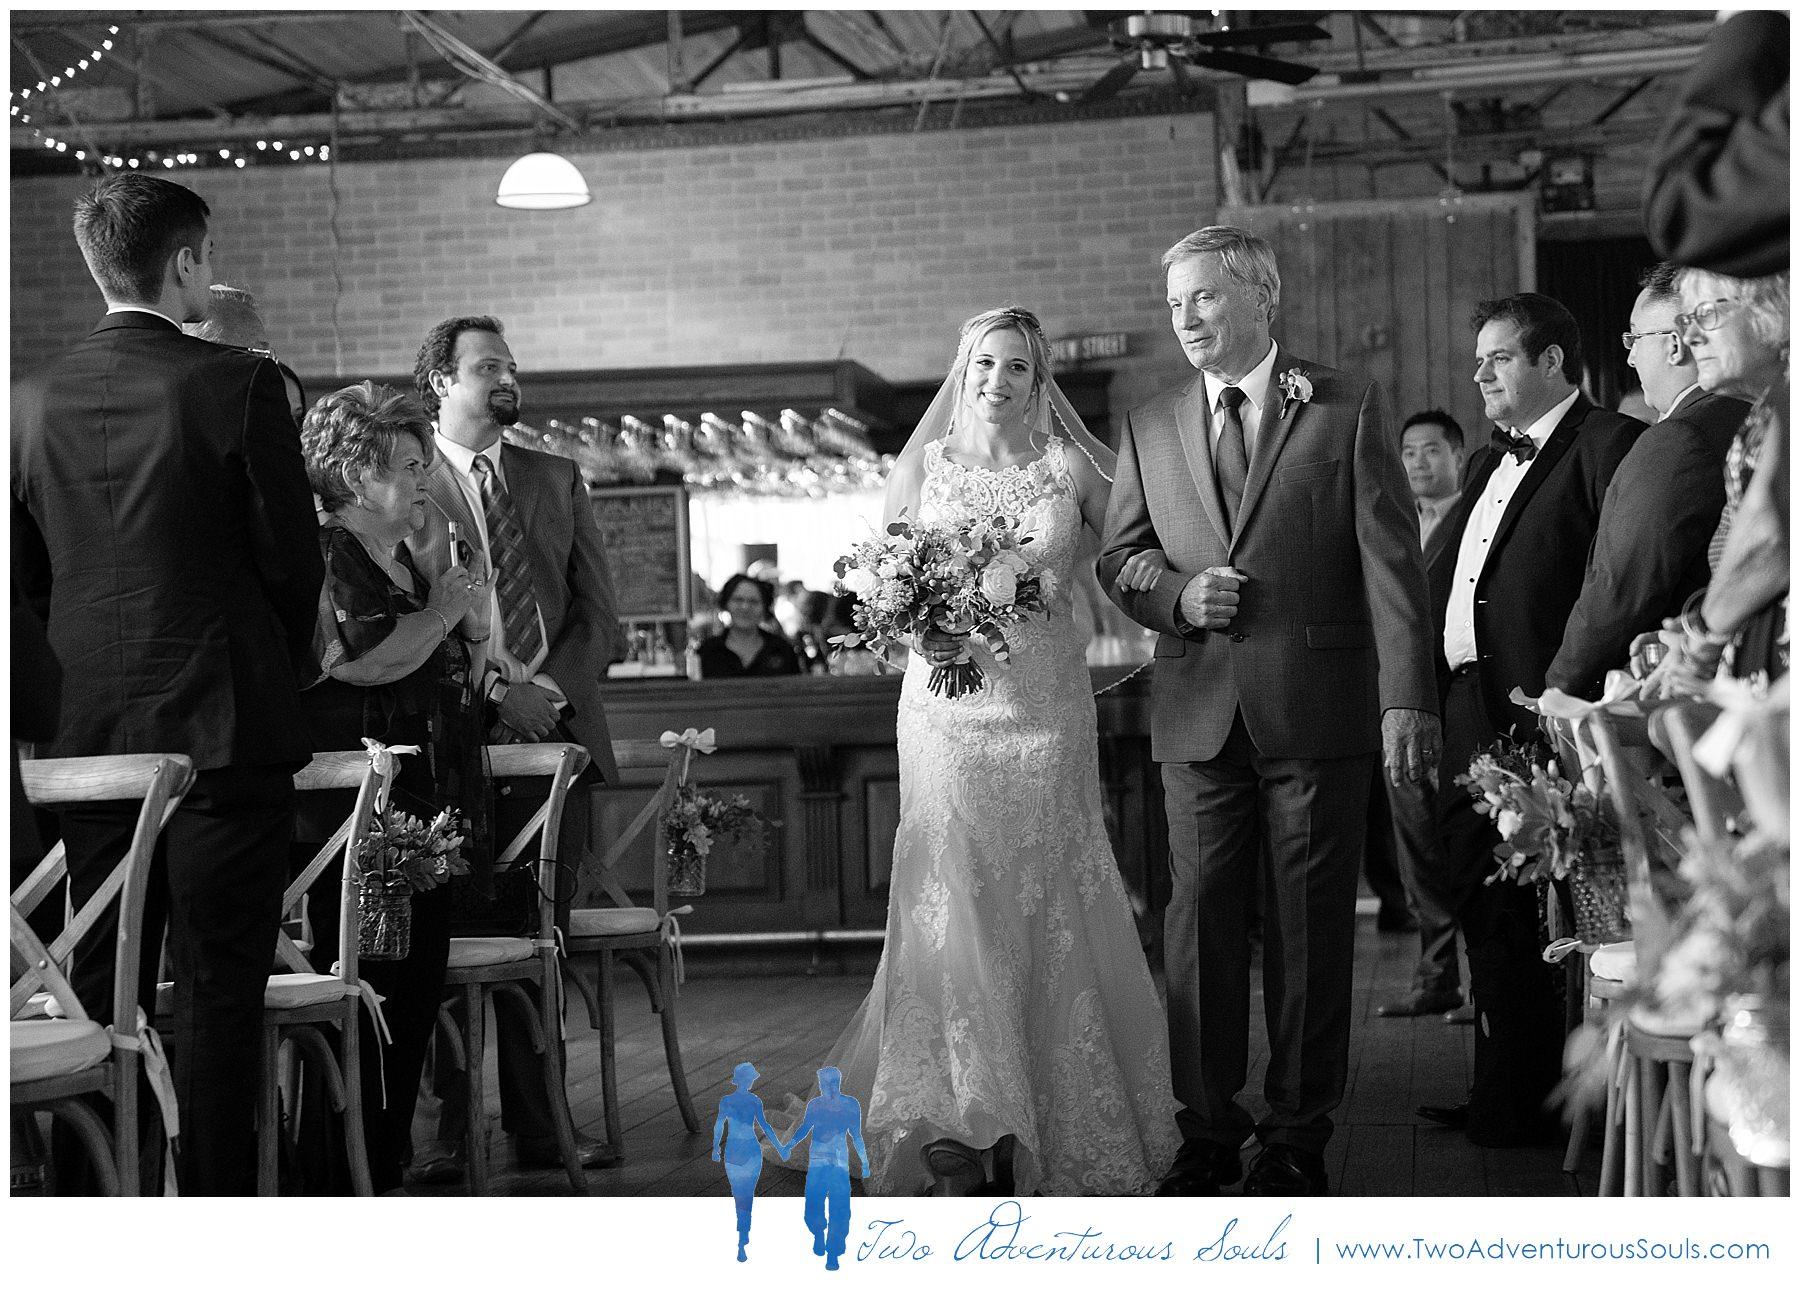 Connecticut Wedding Photographers, Lace Factory Wedding Photographers, Two Adventurous Souls - 083119_0034.jpg